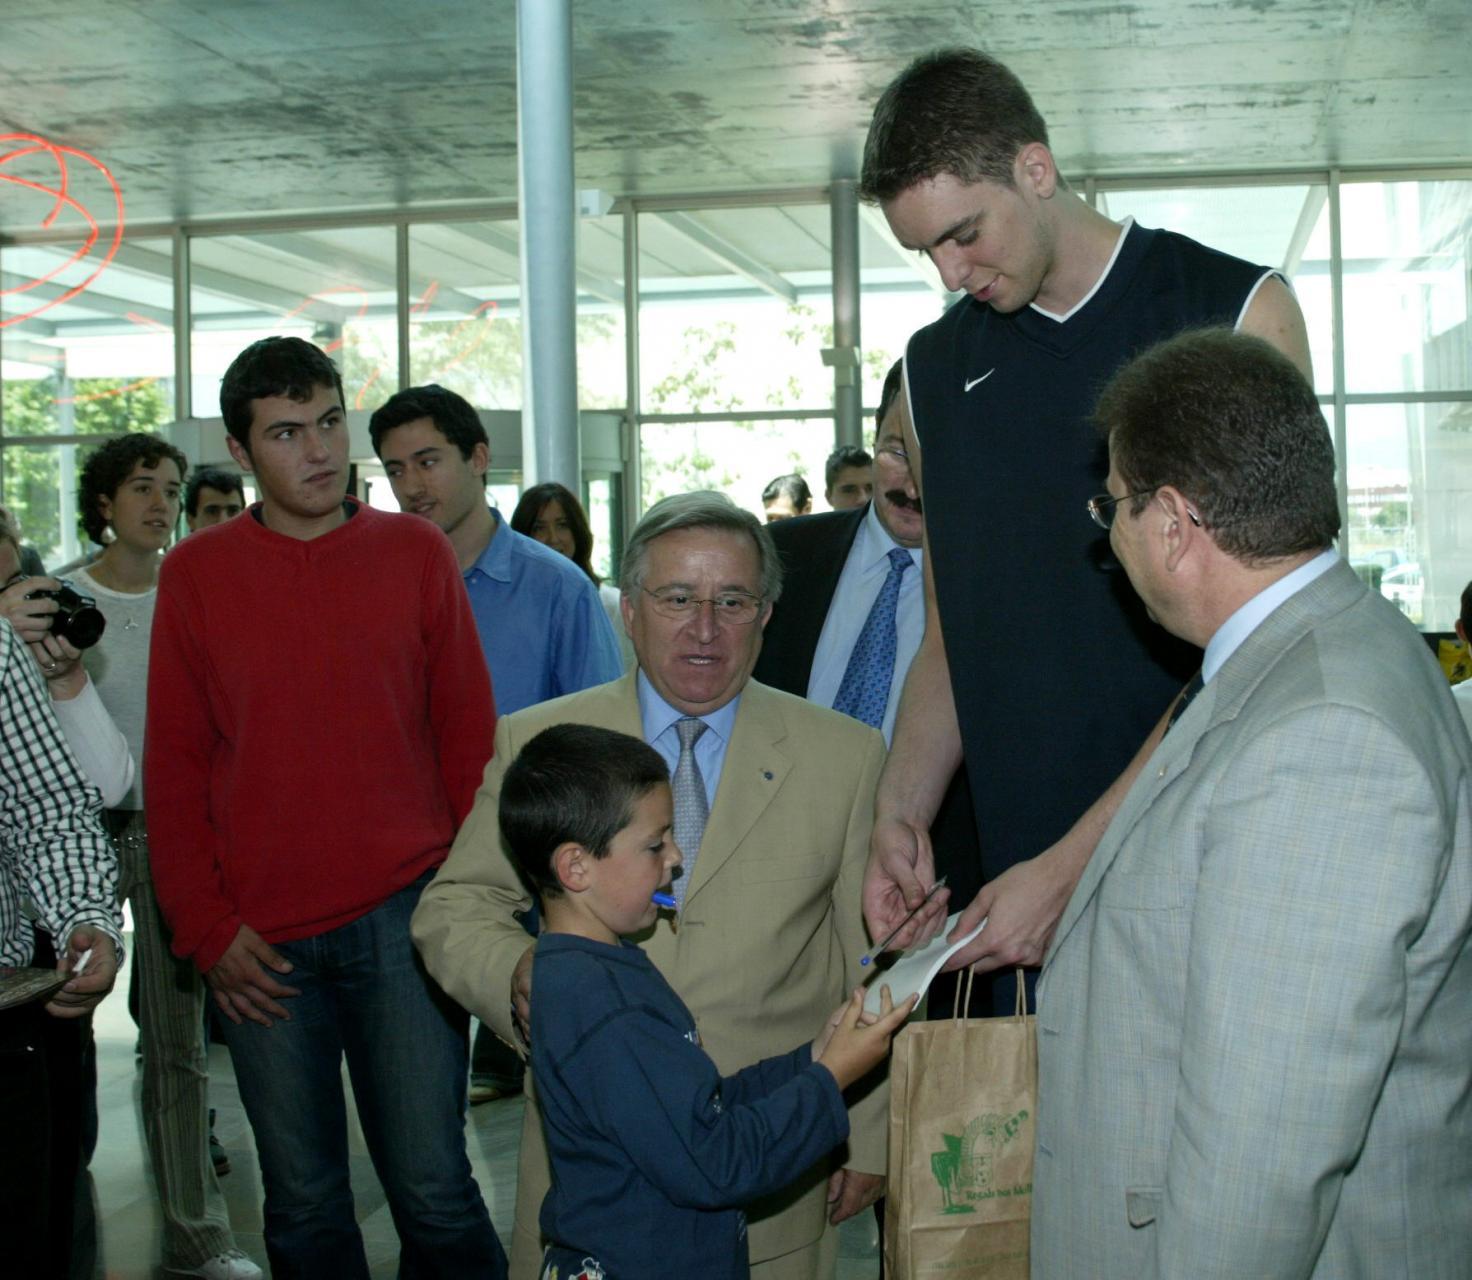 EL JUGADOR ESPAÑOL DE LA NBA PAU GASOL PARTICIPO EN LOS ACTOS DE LA FIRA DE L'ESPORT